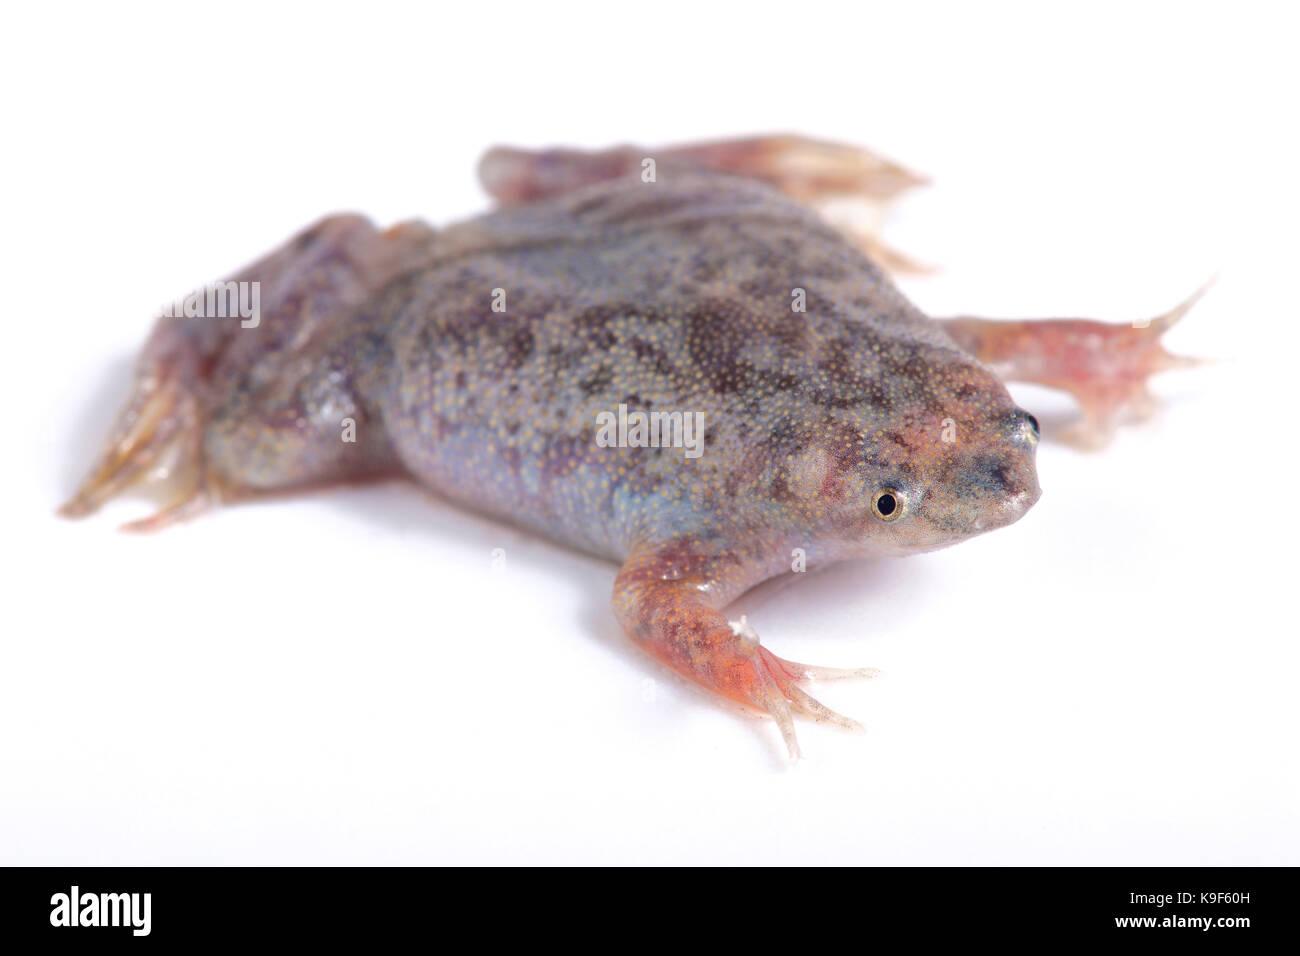 Sabana Surinam toad, Pipa parva - Stock Image